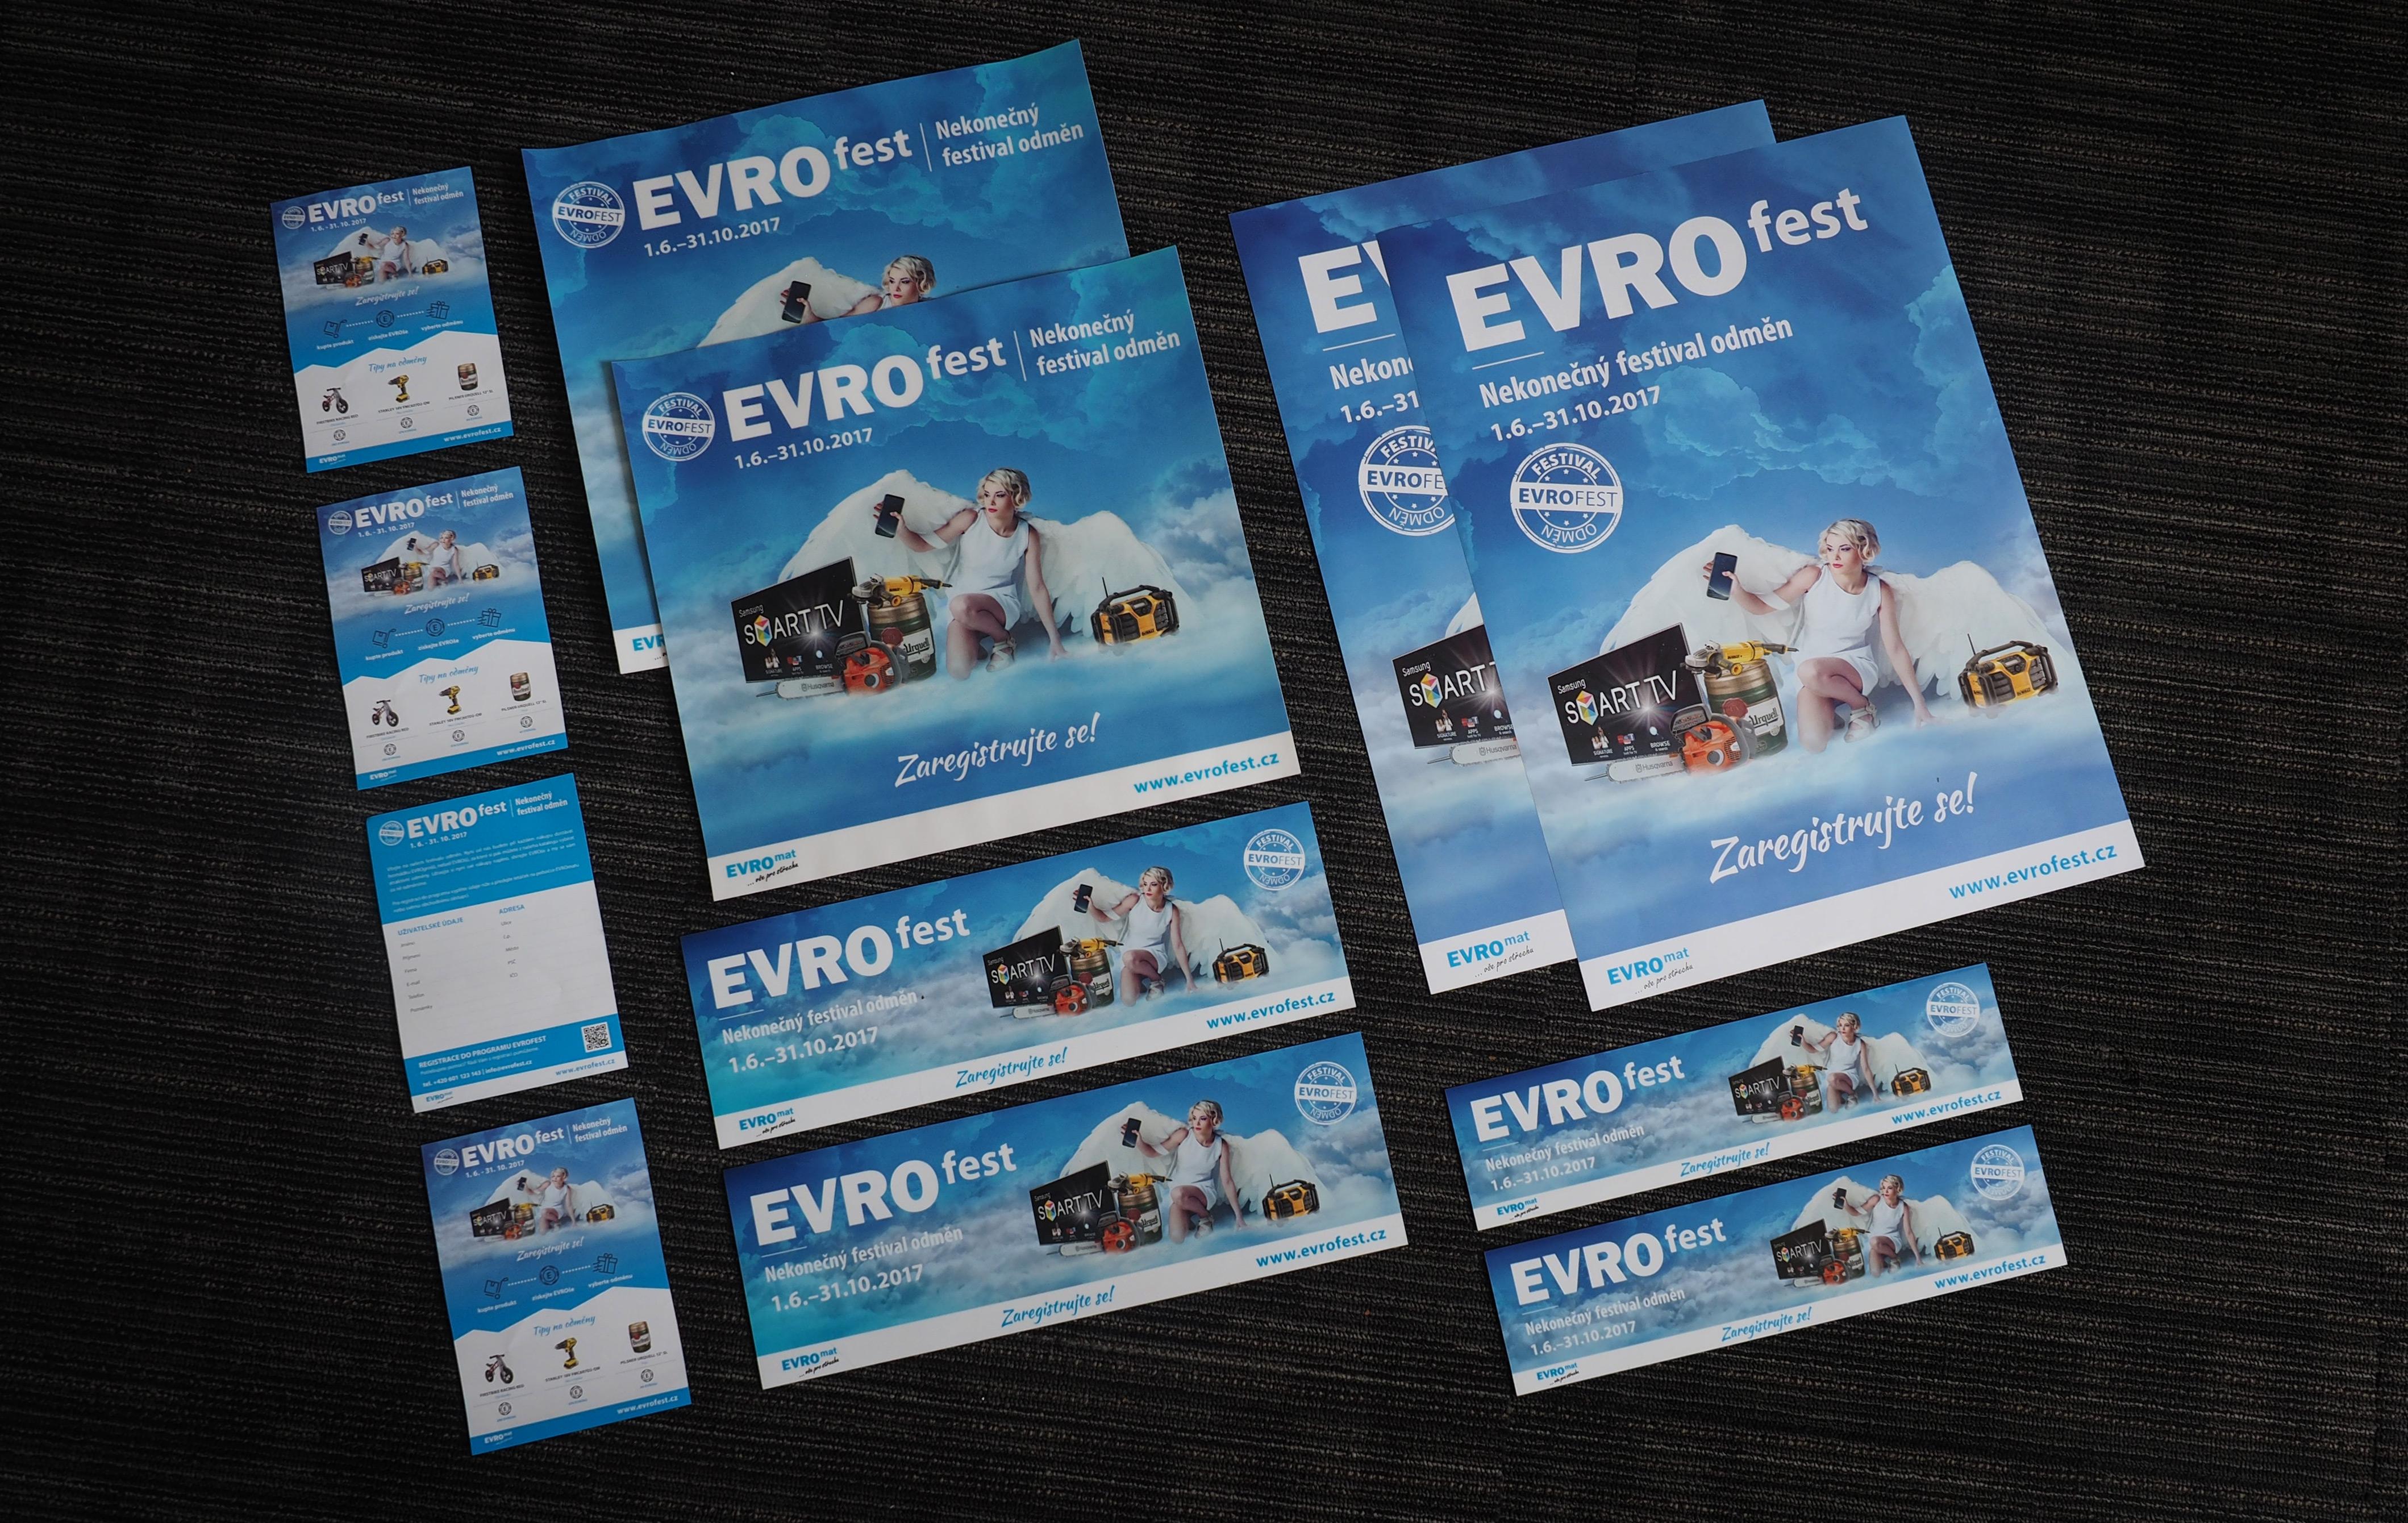 Festival odměn – EVROfest